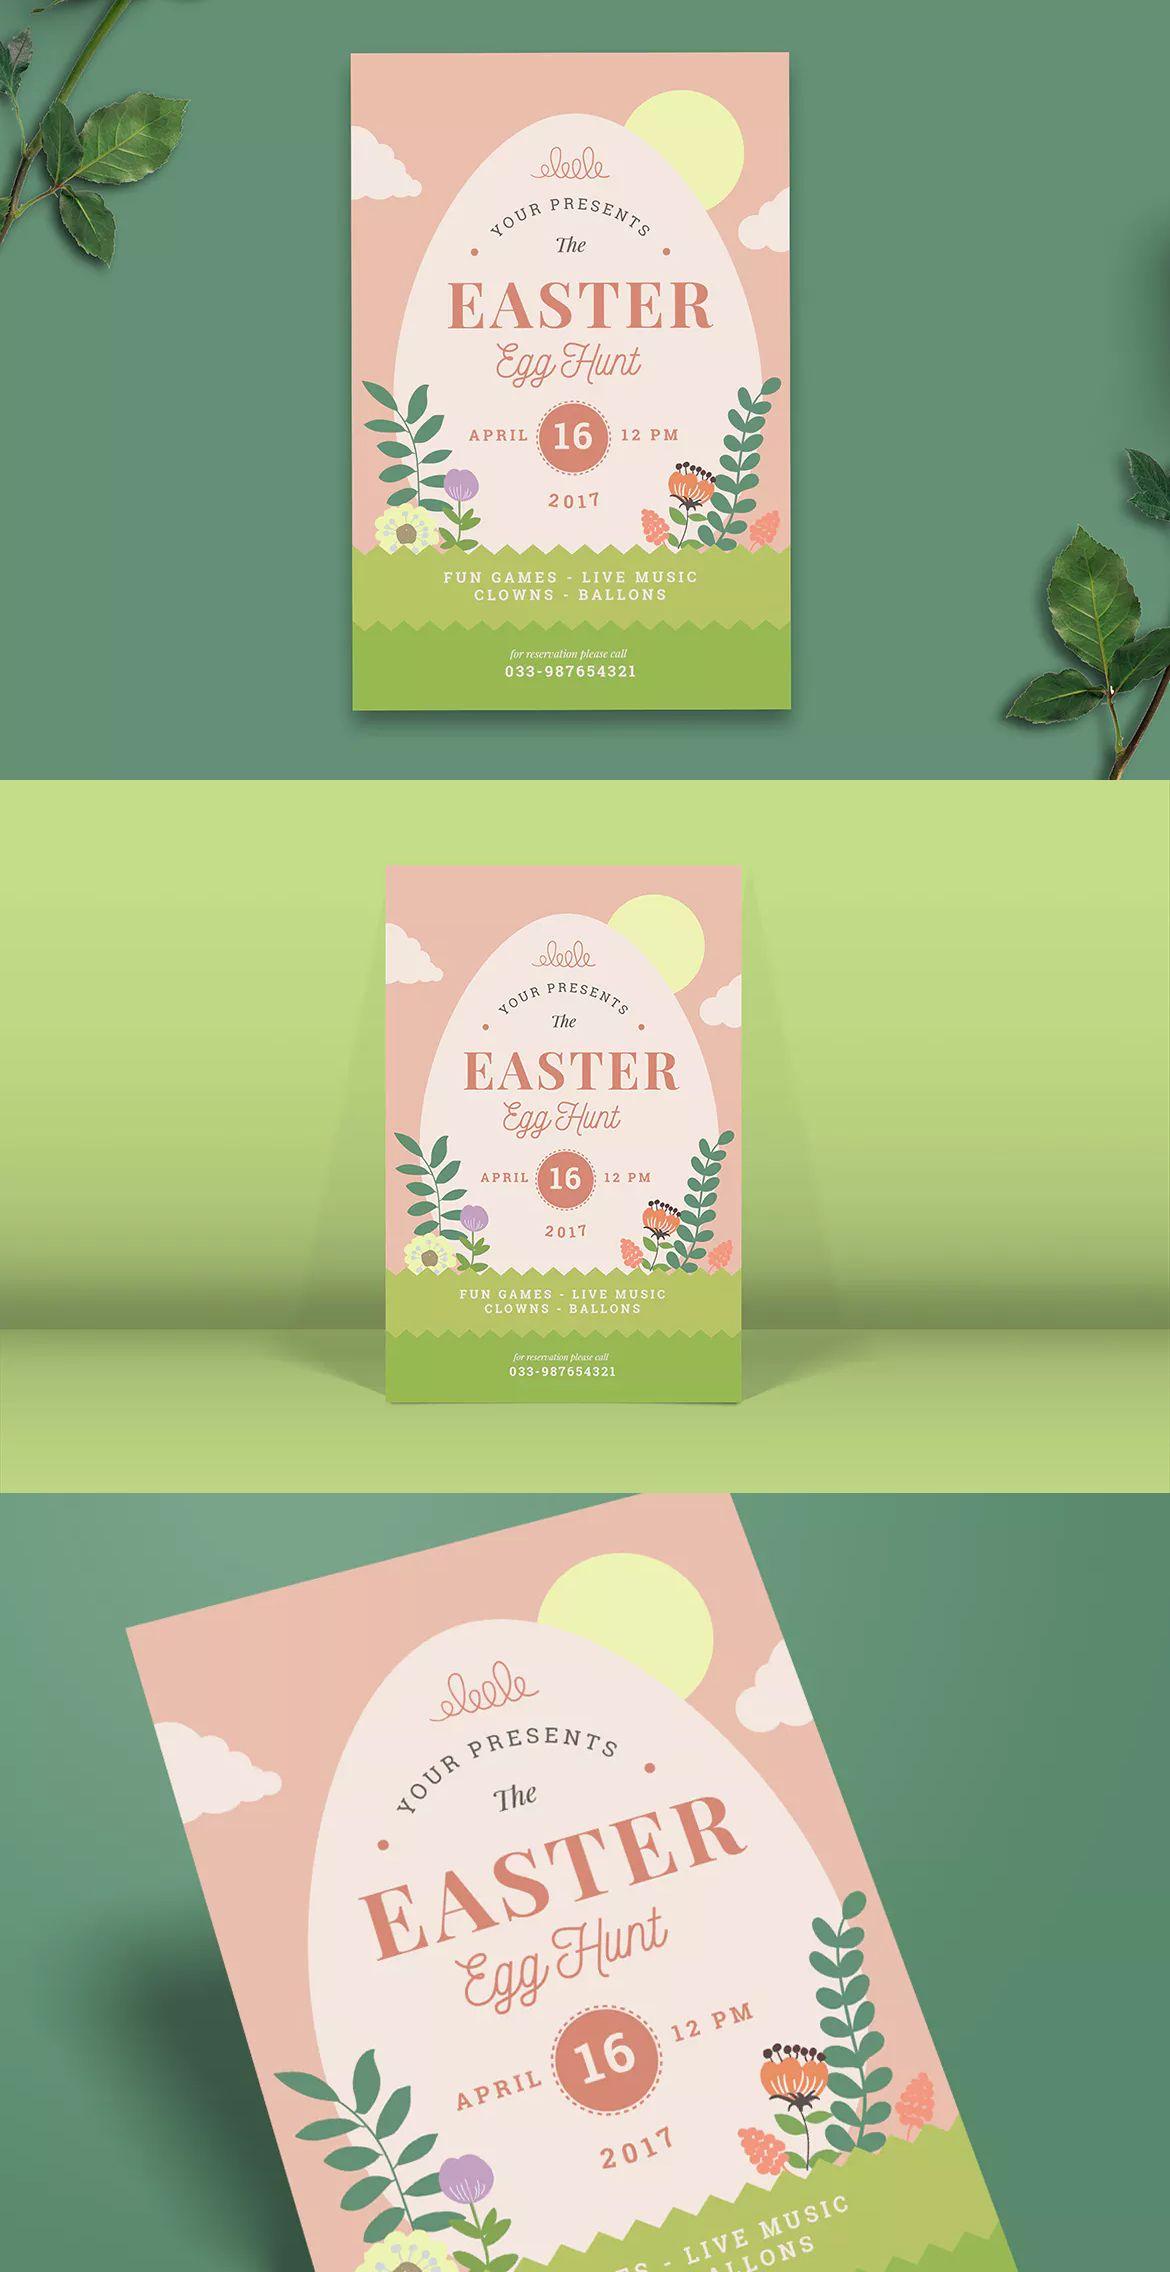 Easter Egg Hunt Flyer Template AI PSD